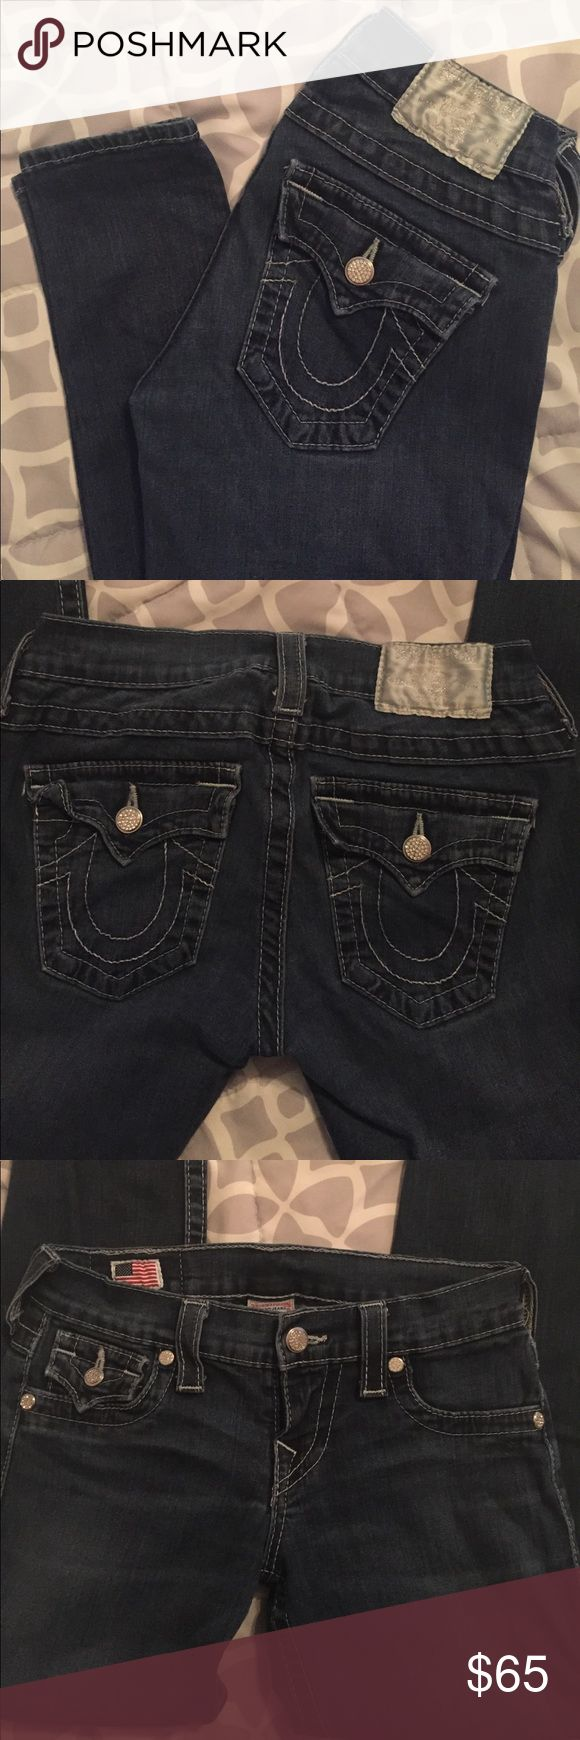 True Religion skinny jeans True Religion skinny jeans True Religion Jeans Skinny